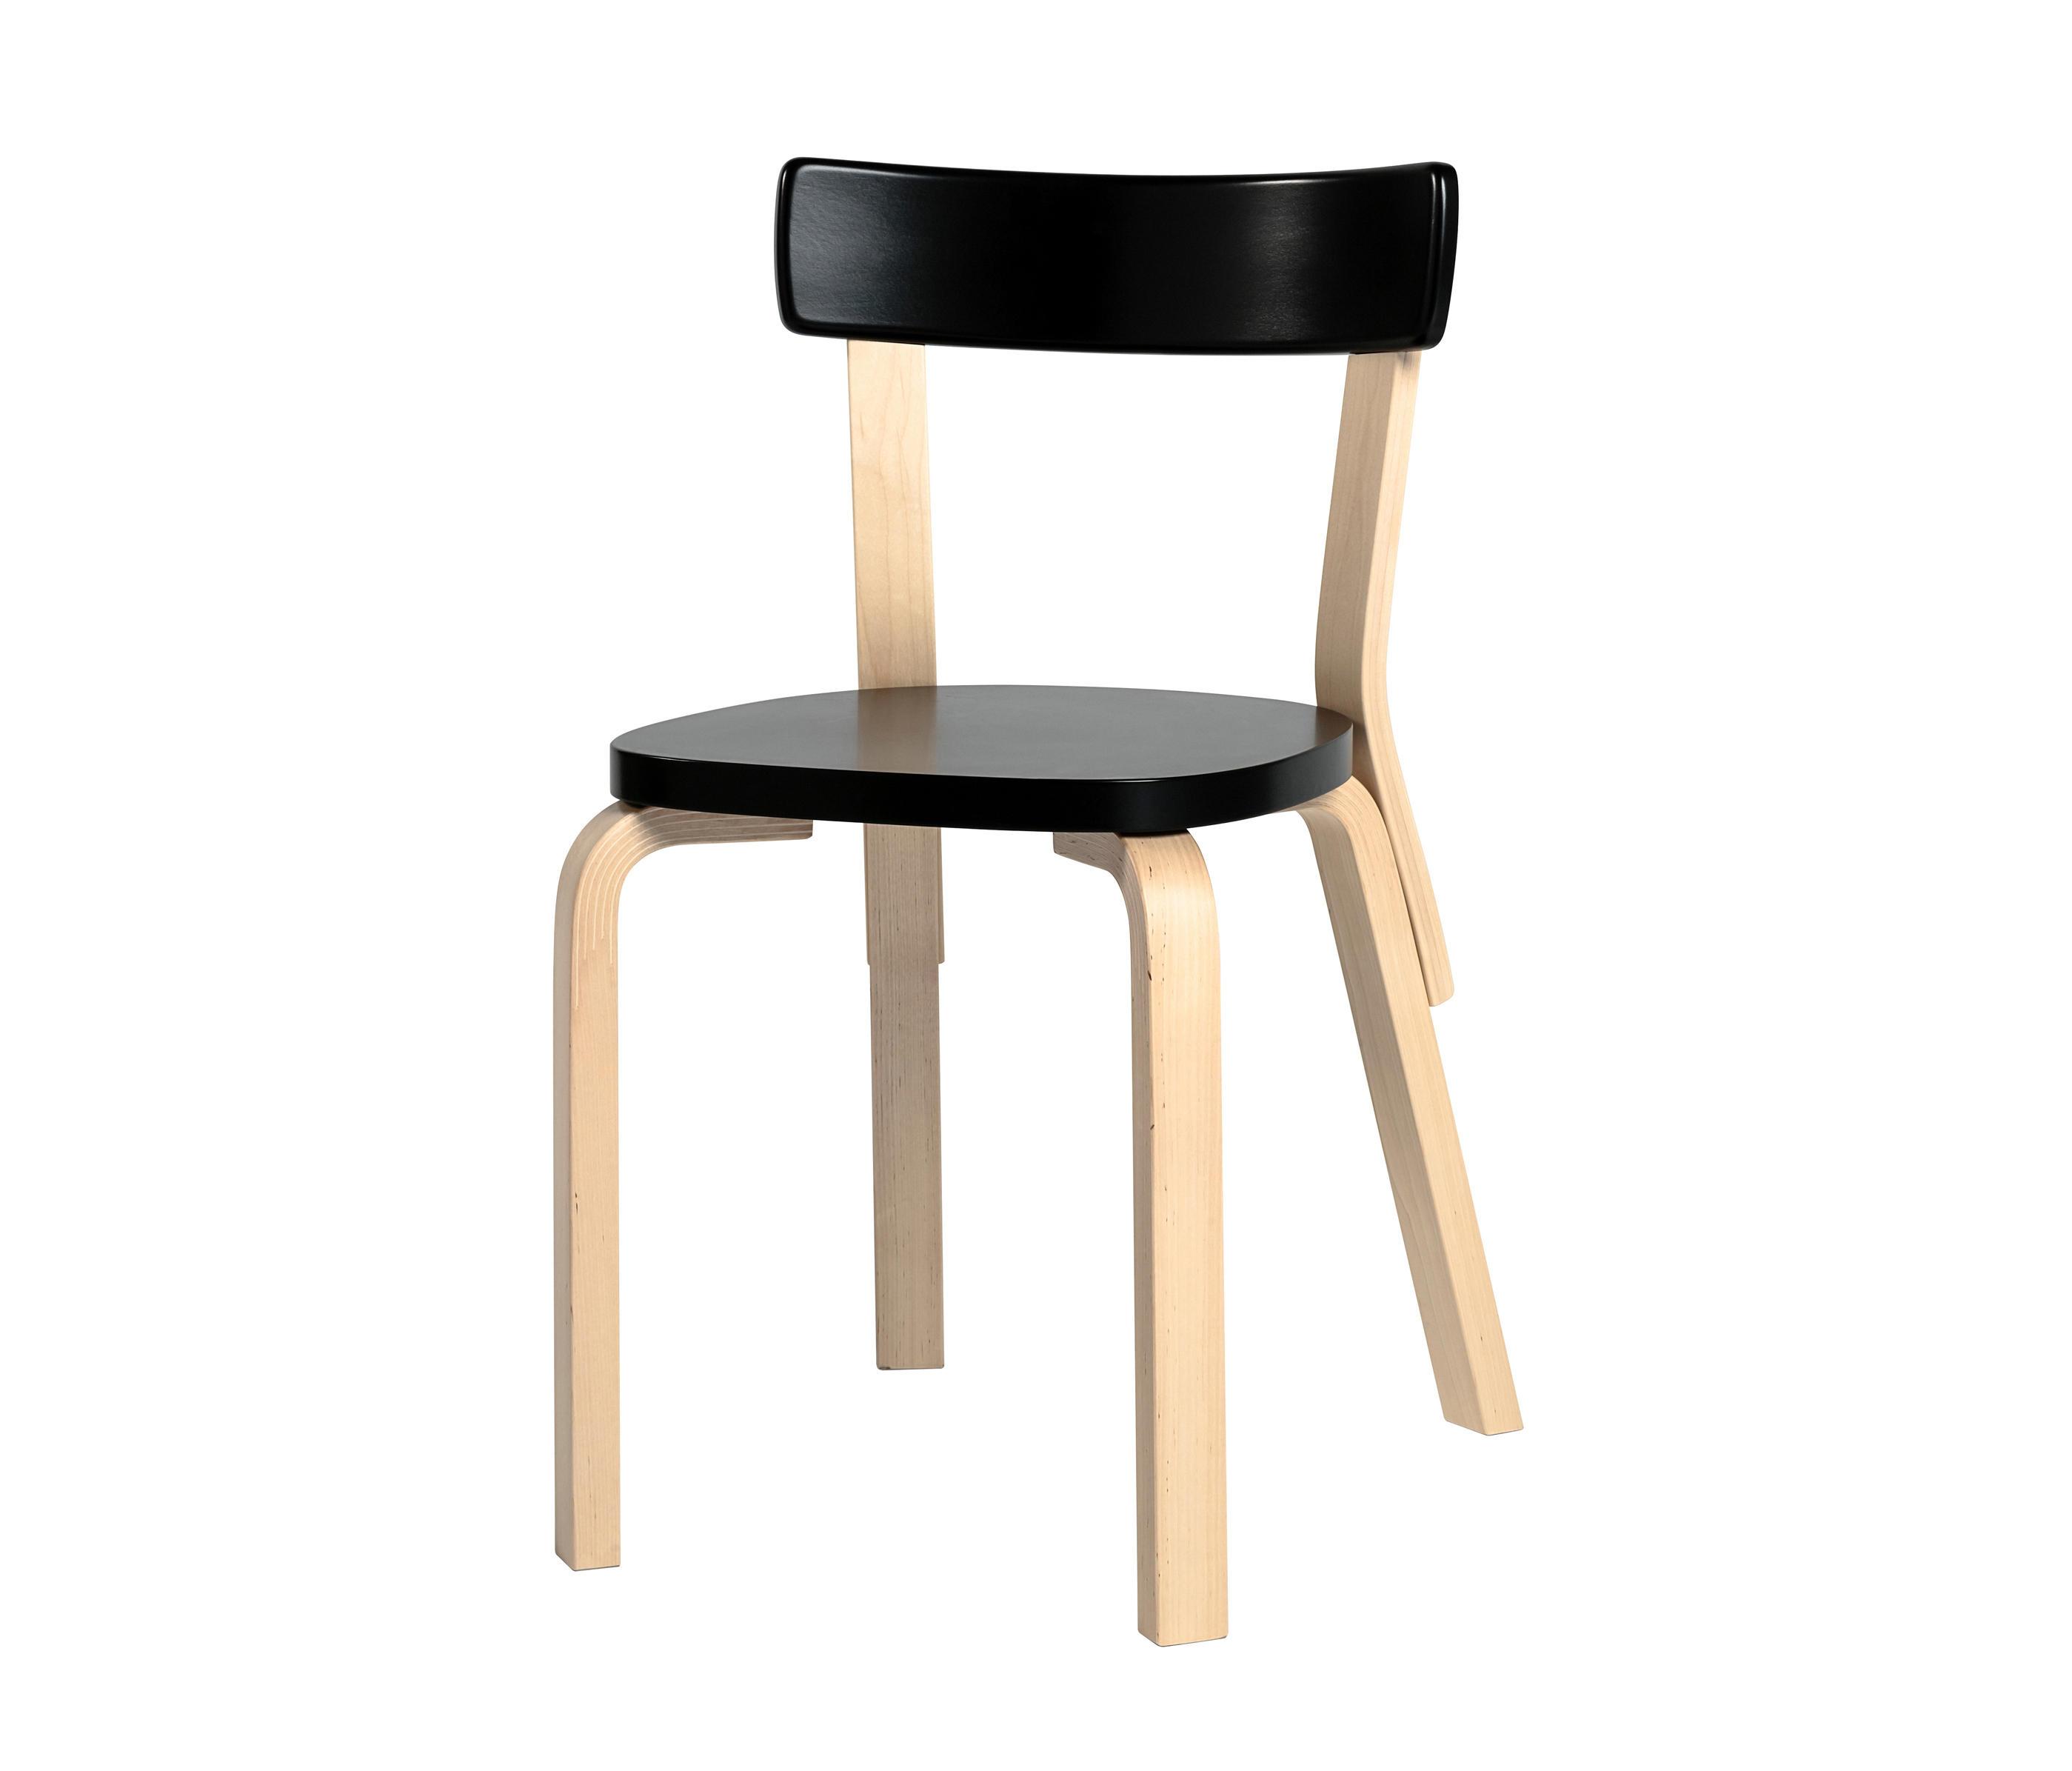 Artek Dress The Chair : Chair edition paimio restaurant chairs from artek